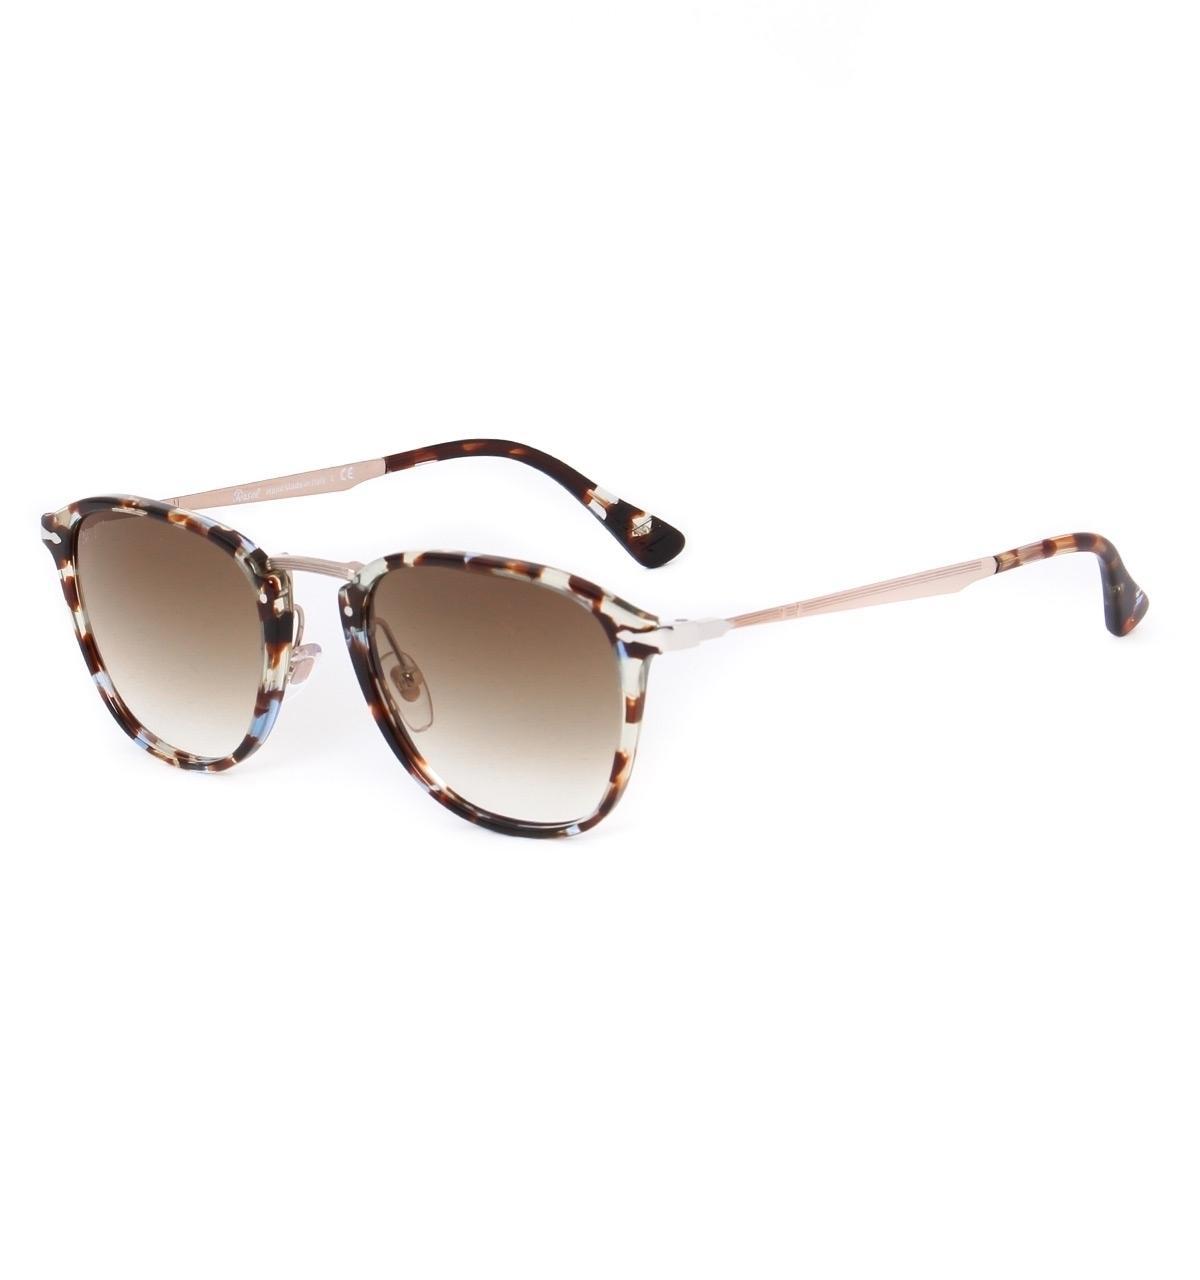 8b55950b576ce Persol. Men s Calligrapher Edition Spotted Havana Blue Acetate Sunglasses